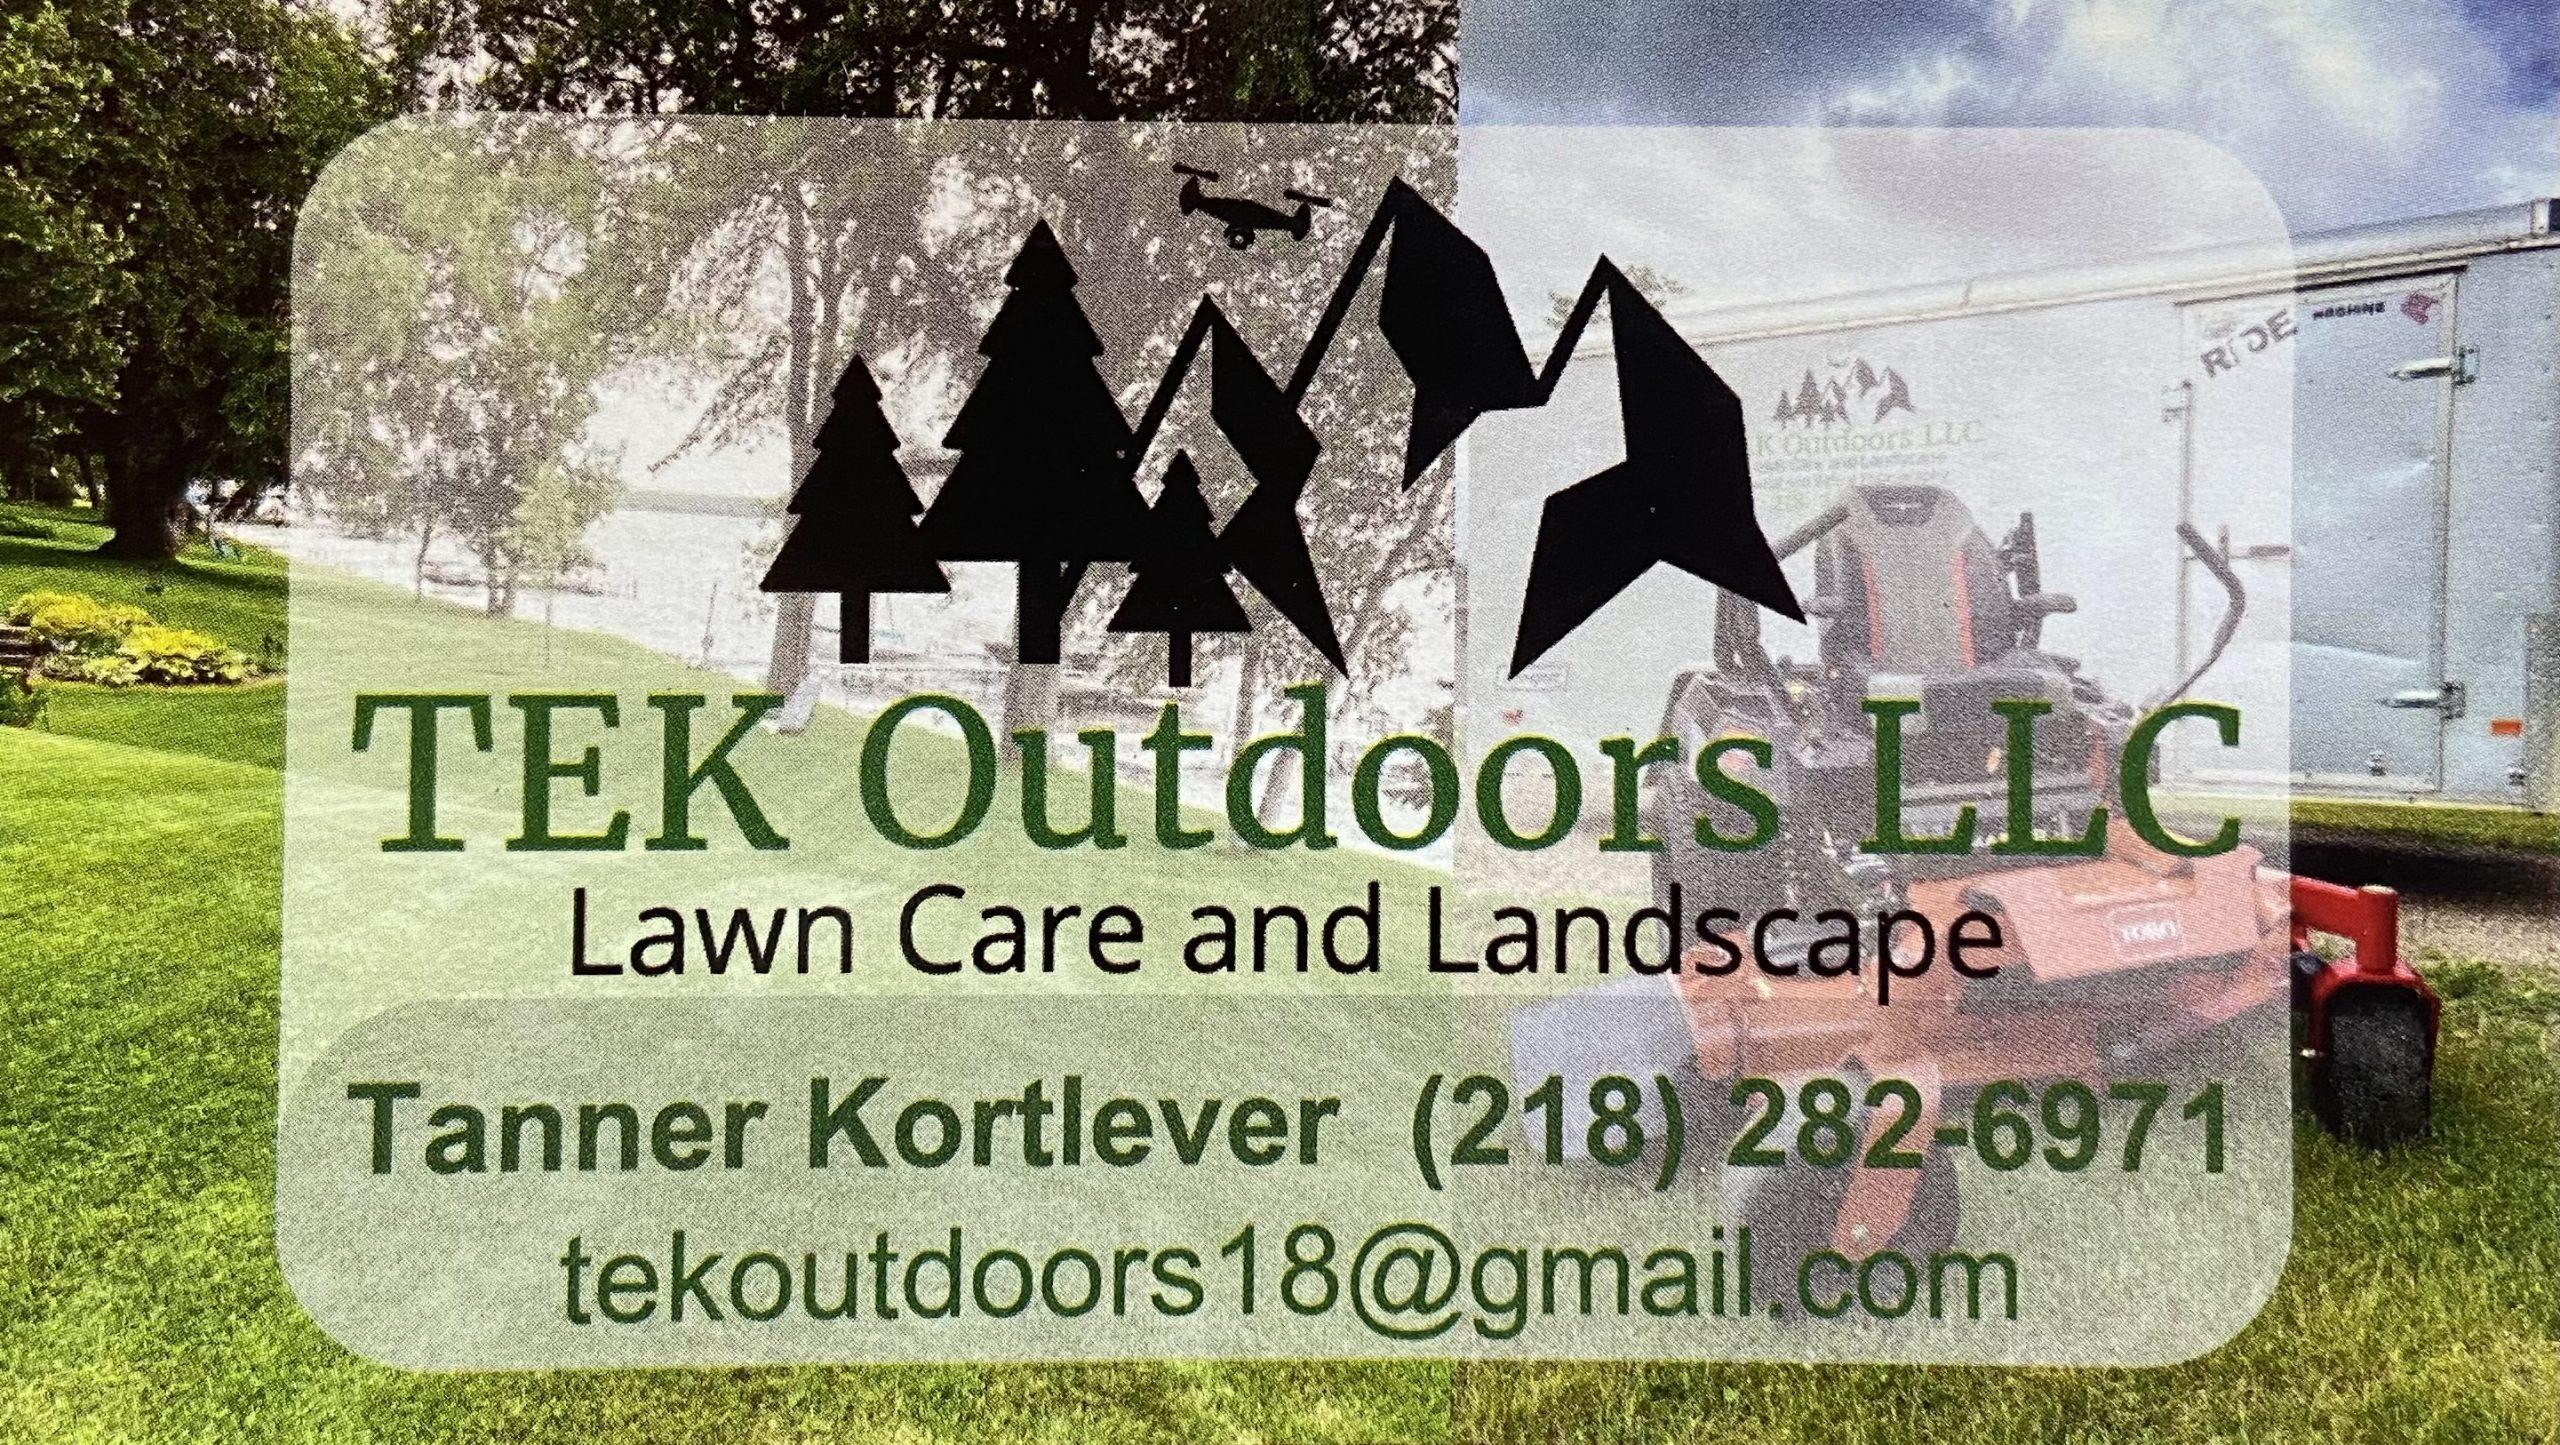 TEK Outdoors